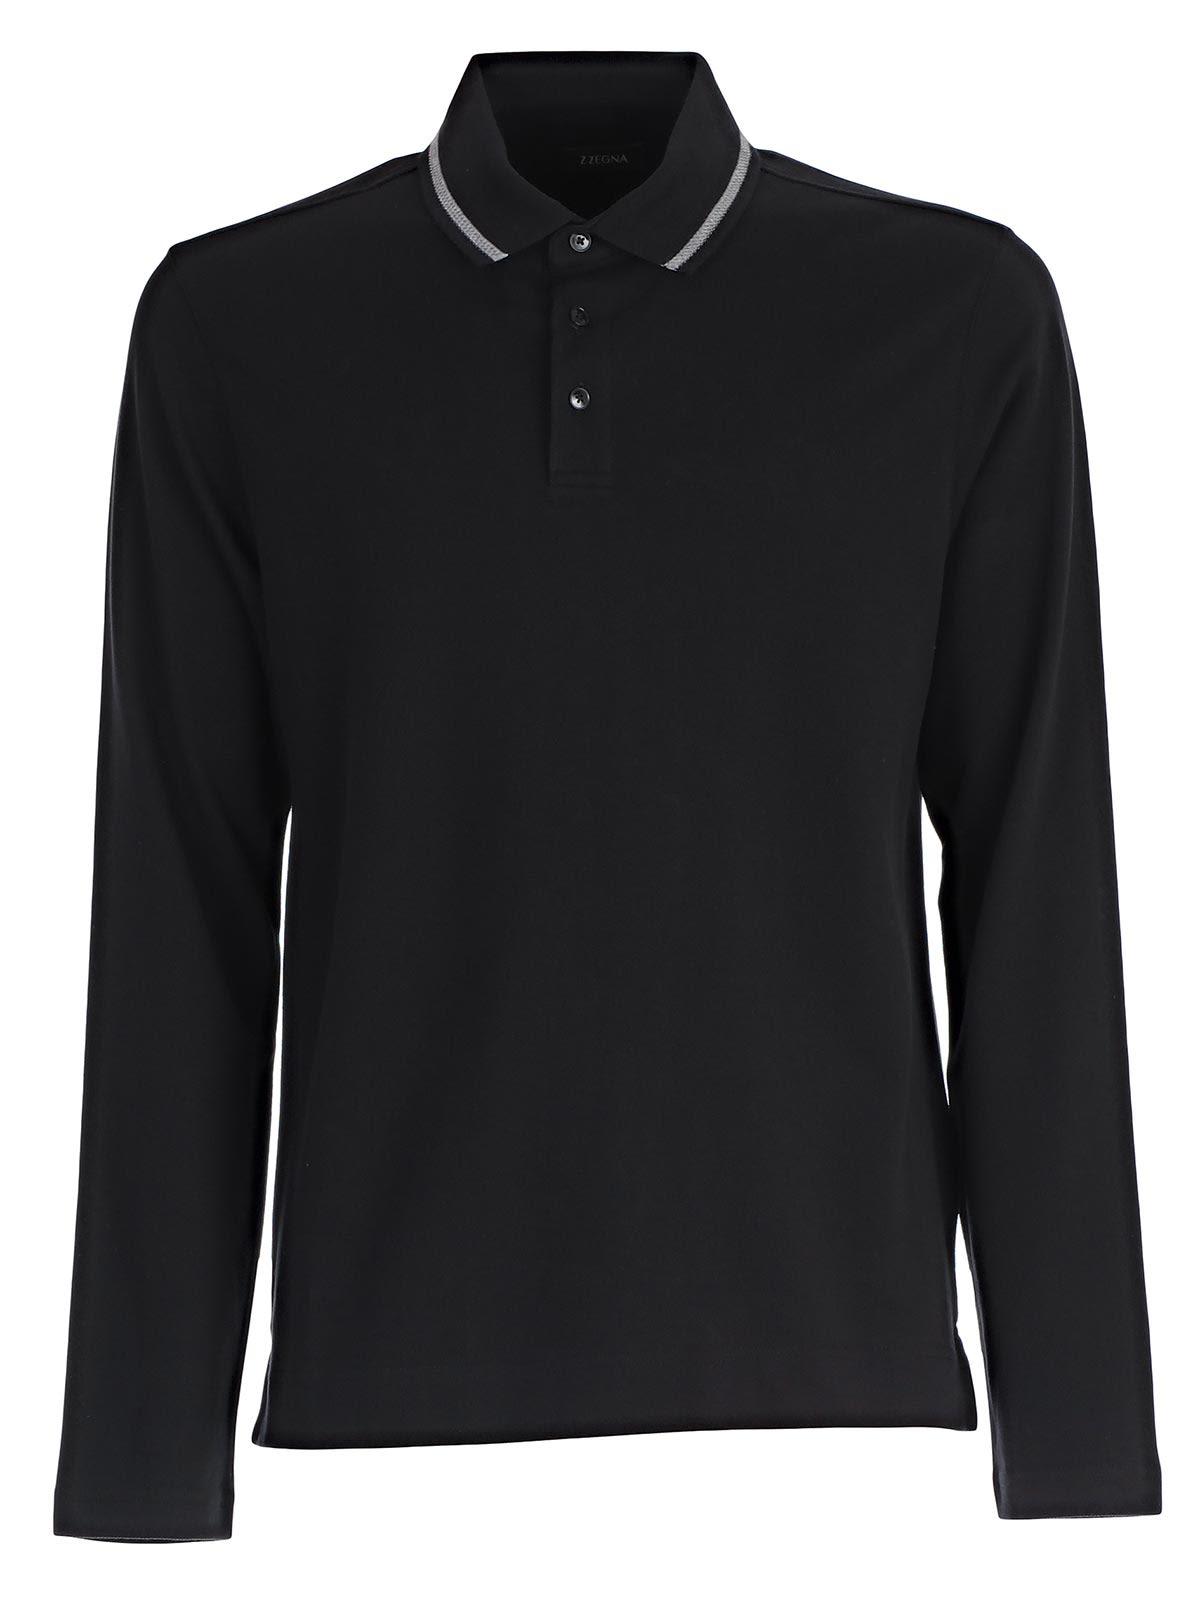 Z zegna z zegna polo shirt kblack men 39 s polo shirts for Zegna polo shirts sale